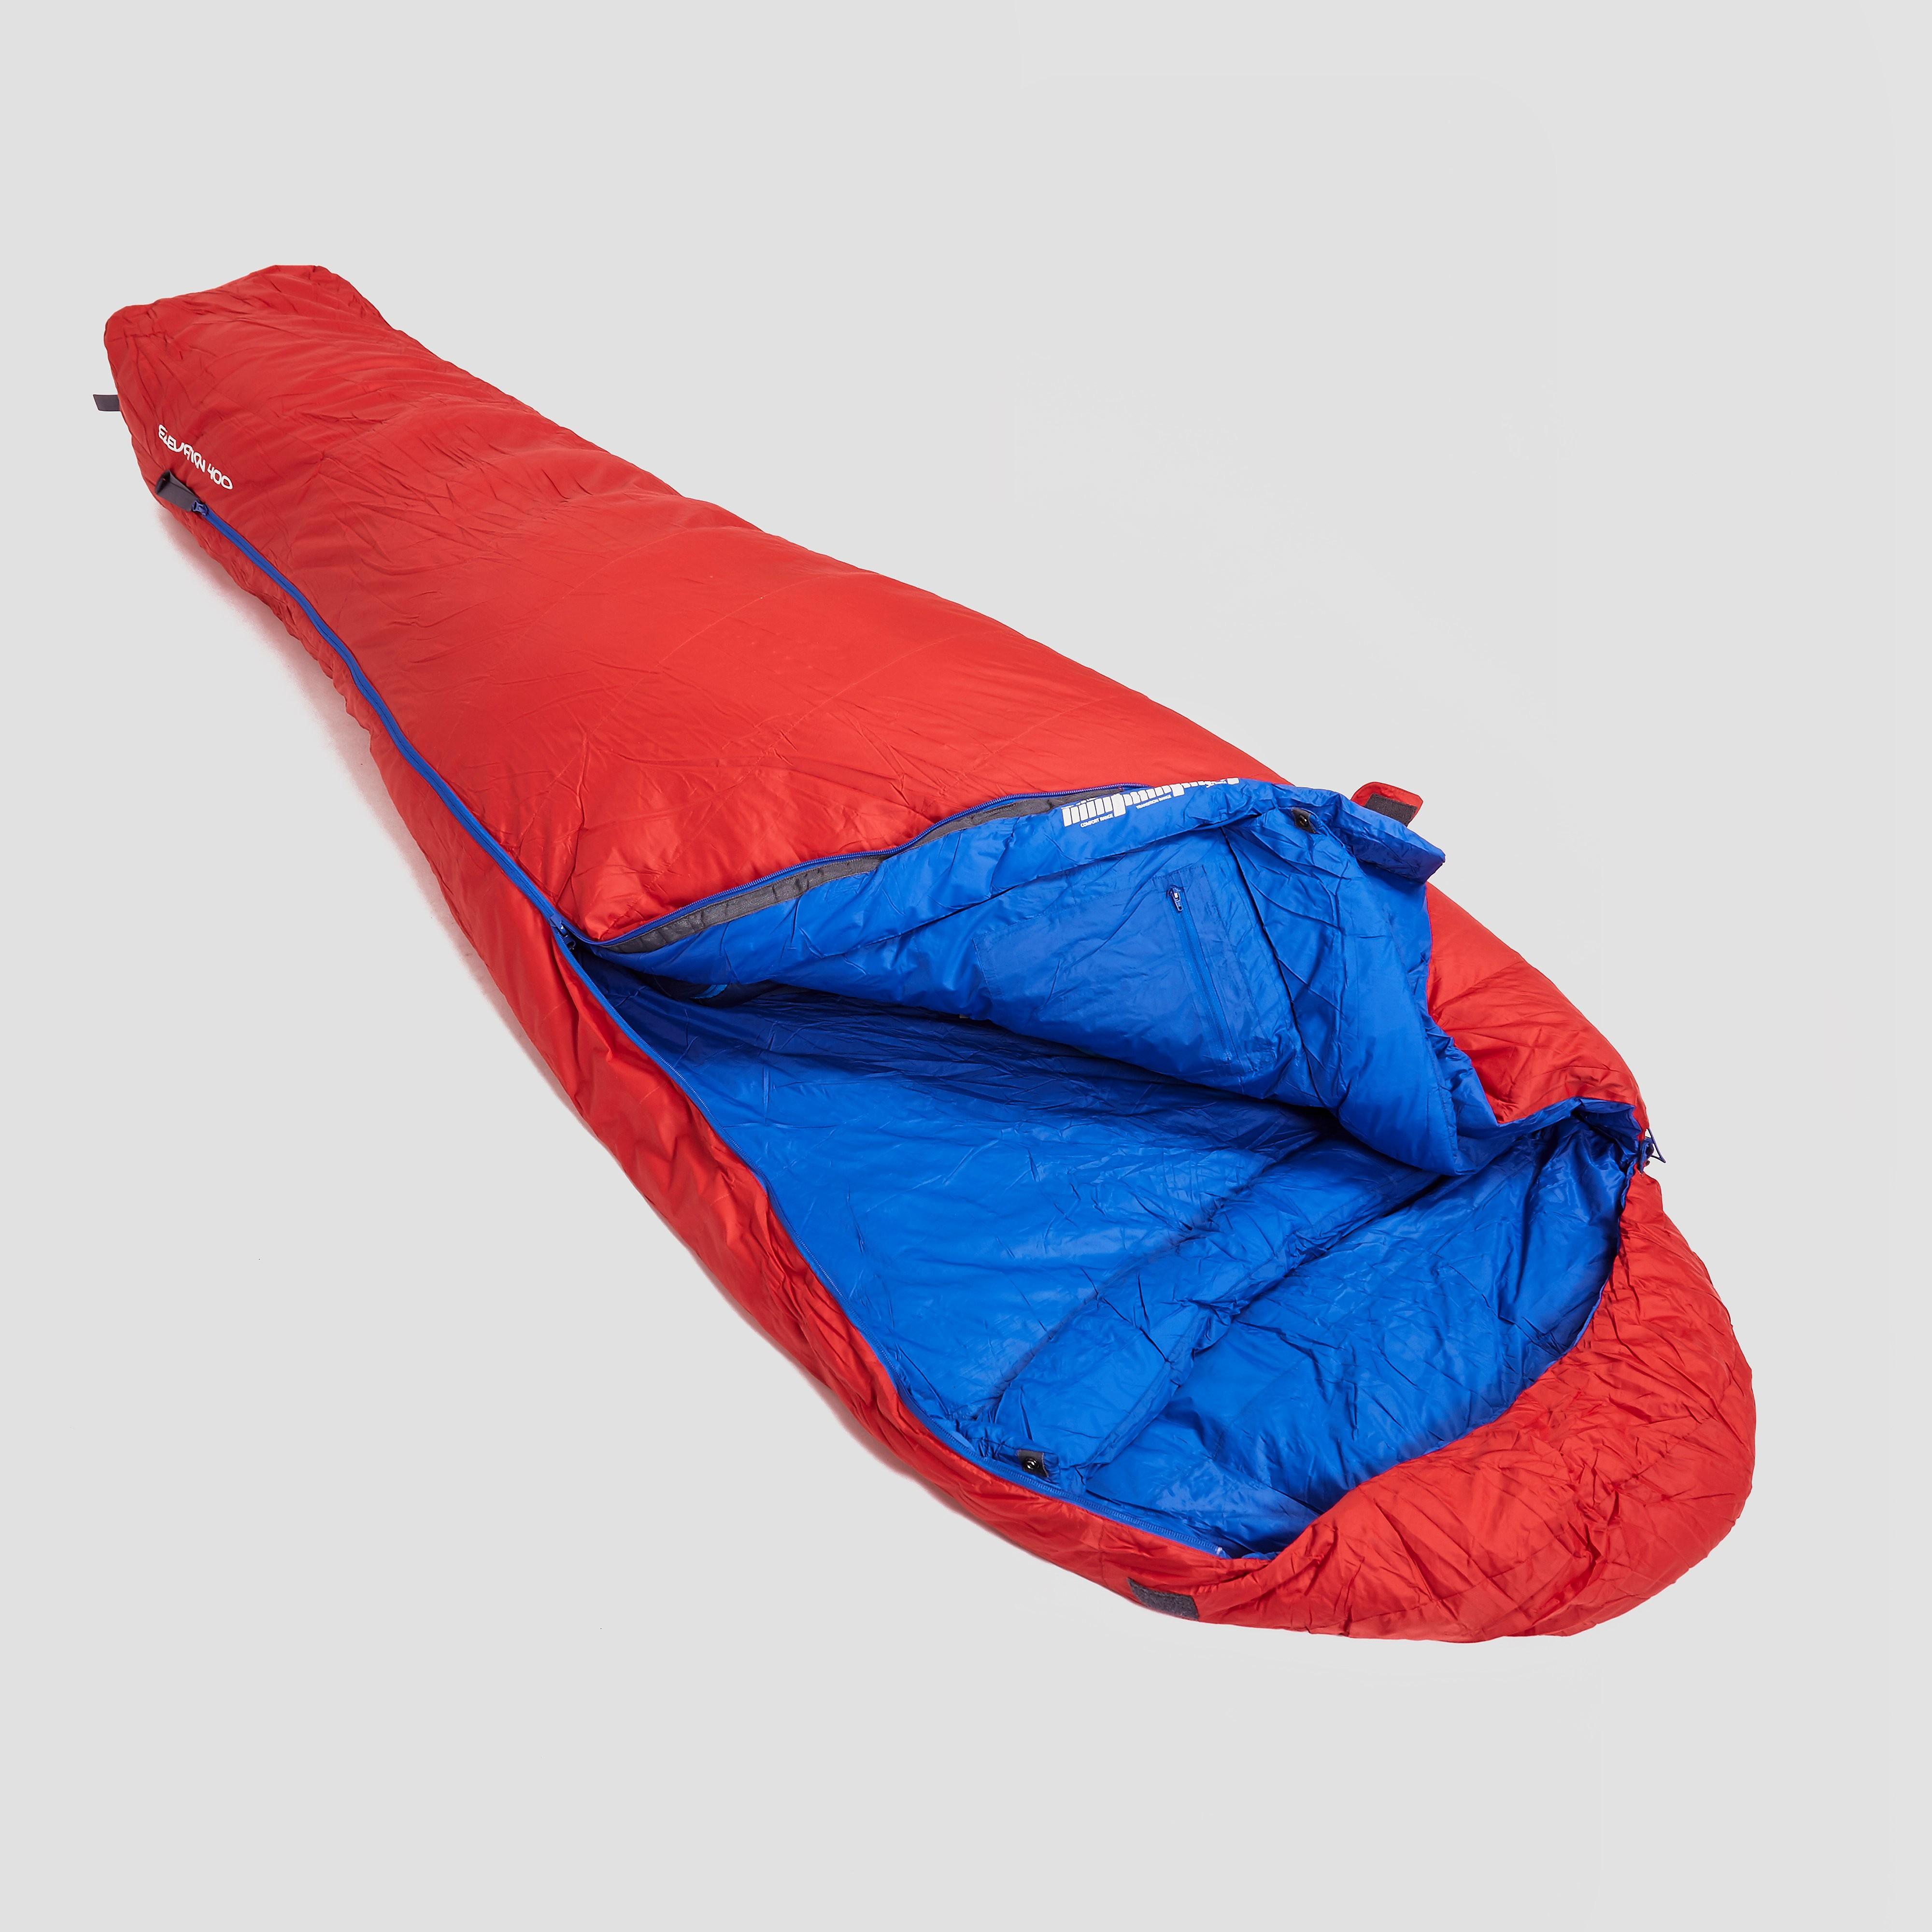 Berghaus Elevation 400 Sleeping Bag